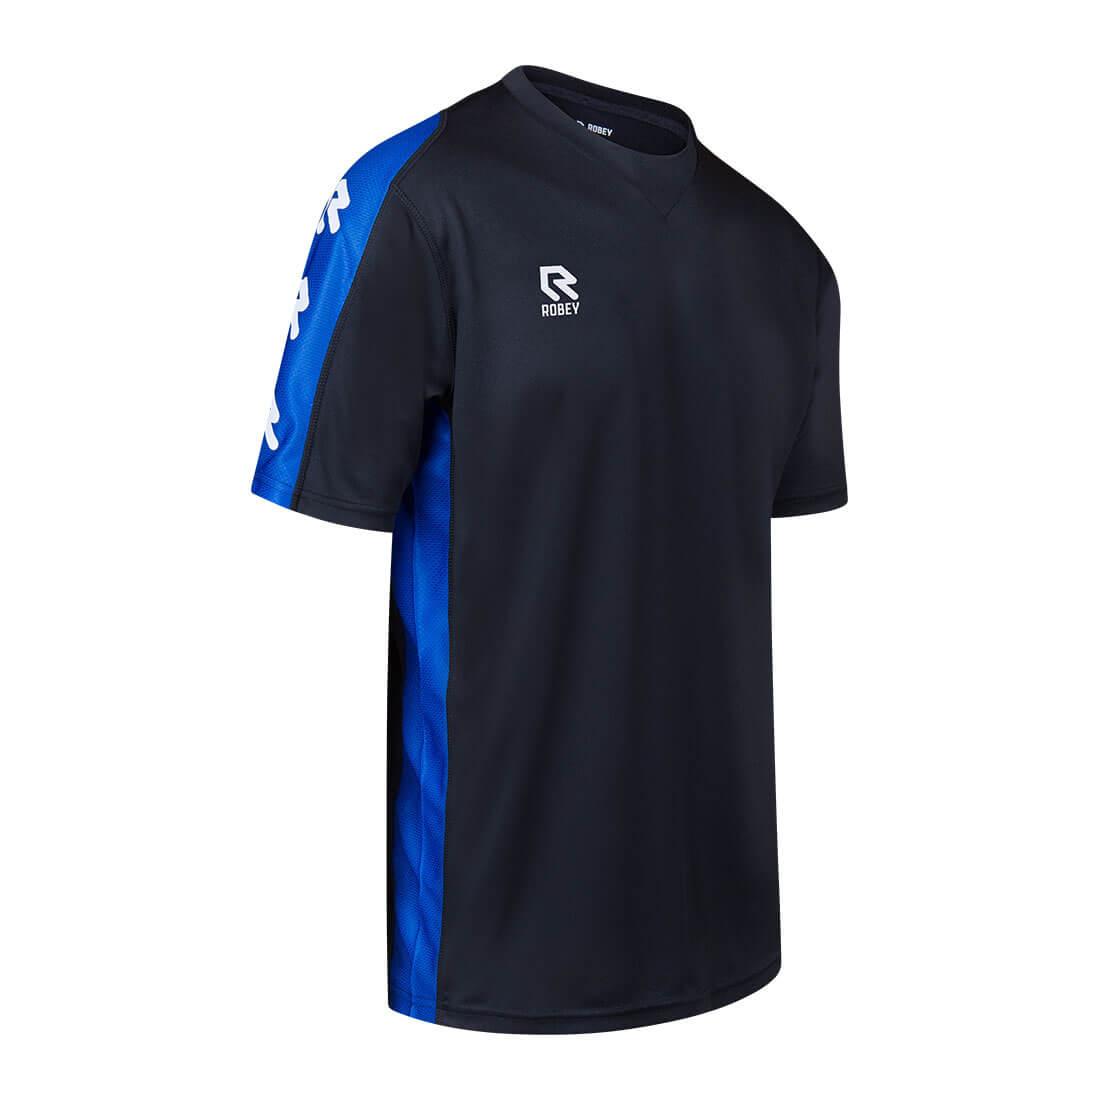 Robey Performance Shirt - Black Royal Blue